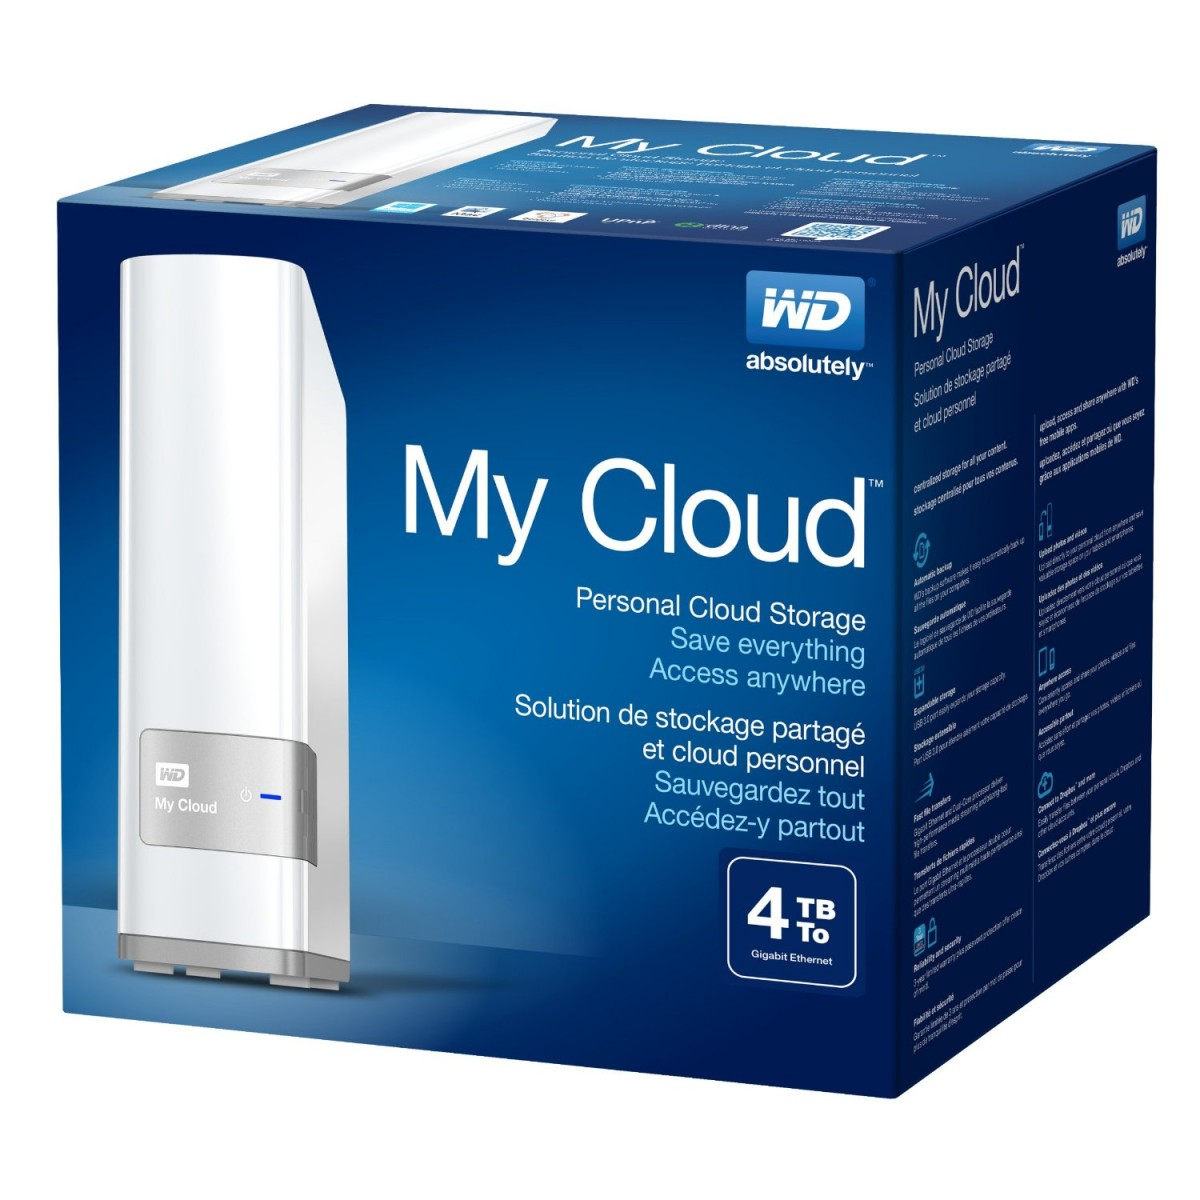 WD 4TB My Cloud External NAS Hard Drive